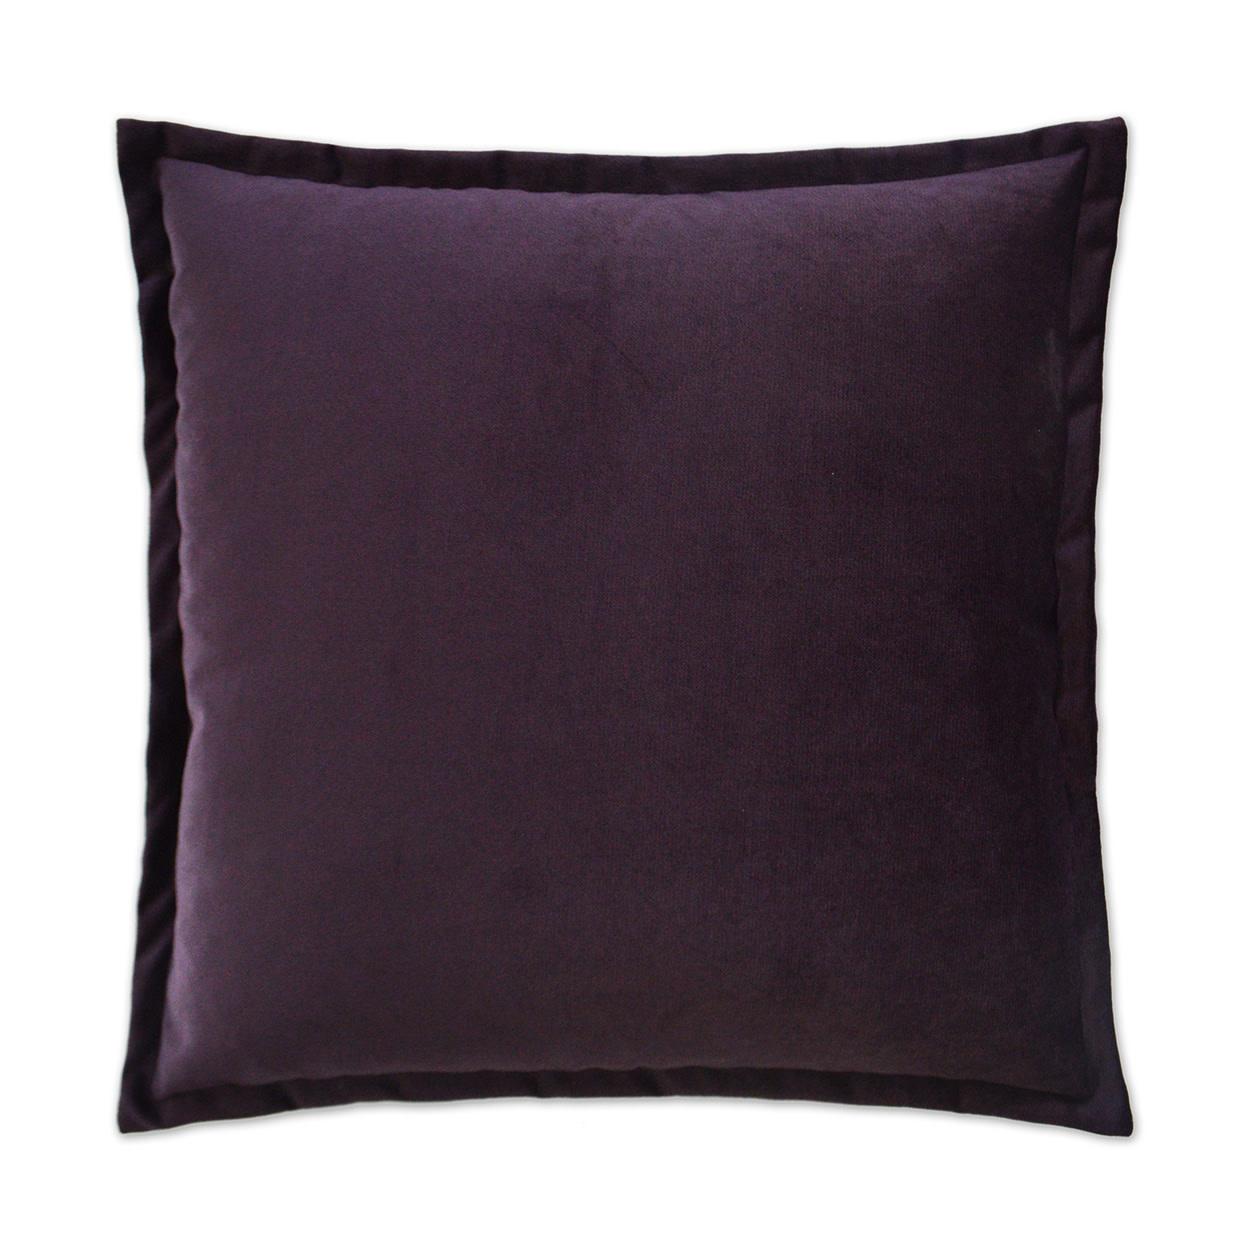 Belvedere Flange Pillow - Amethyst 24 x 24